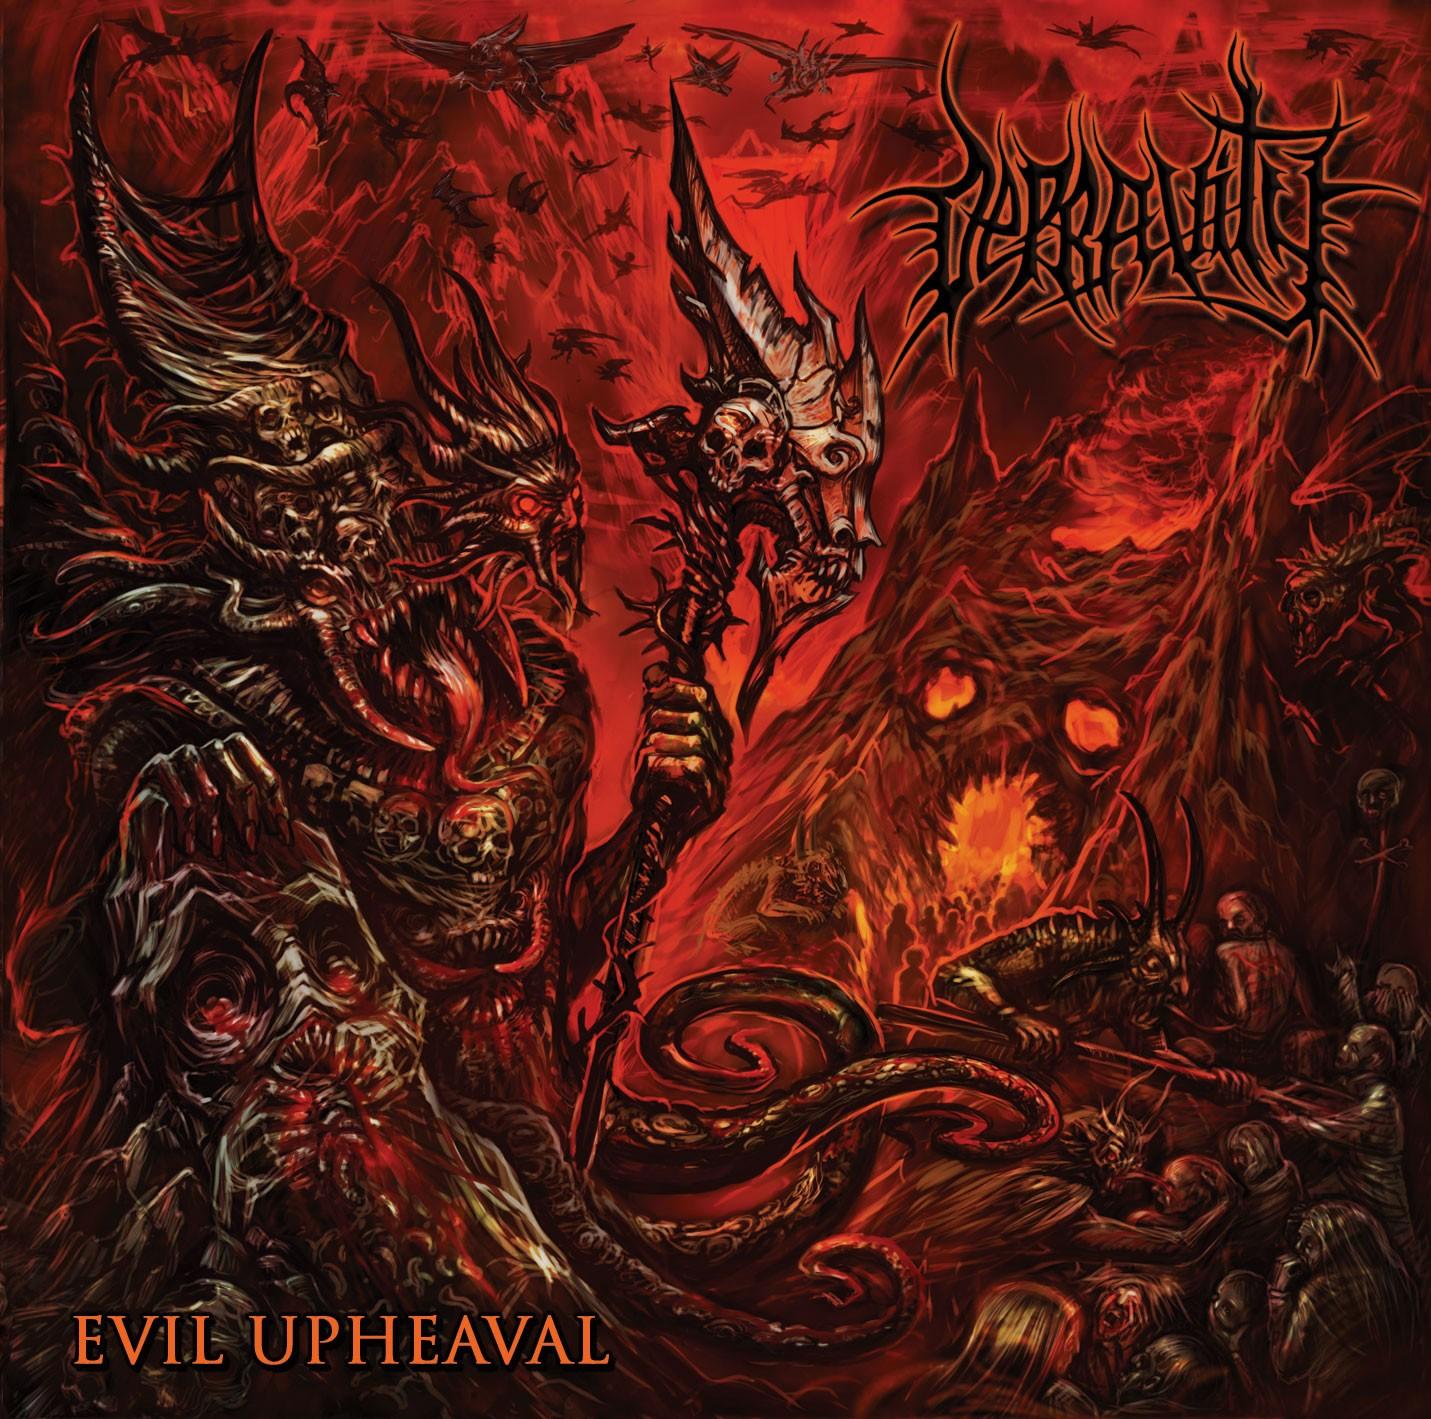 Depravity (Australia) - 'Evil Upheaval' CD